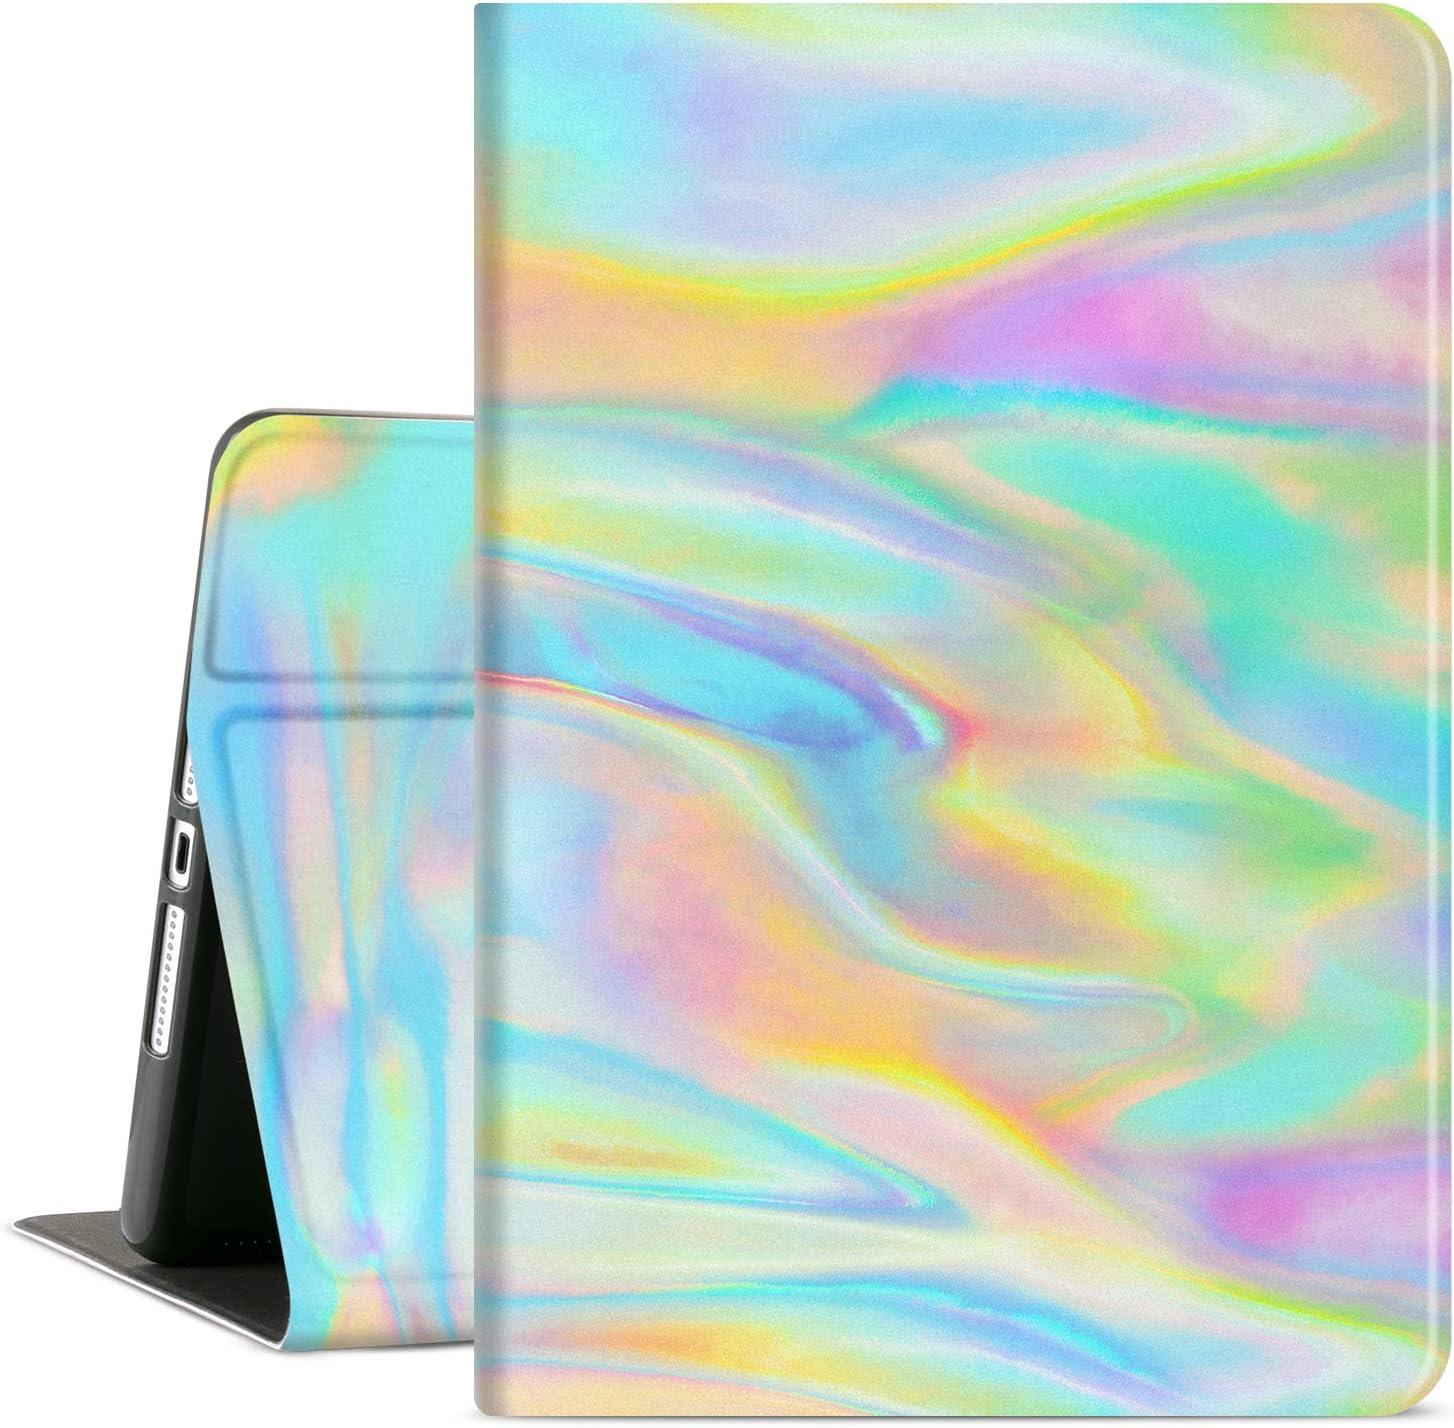 iPad 10.2 Case for iPad 9th Generation, iPad 8th Generation, Cutebricase iPad 7th Gen Case Rainbow, Multi-Angle View Adjustable Stand Soft PU Leather Back Cover Auto Wake / Sleep (Laser Rainbow)